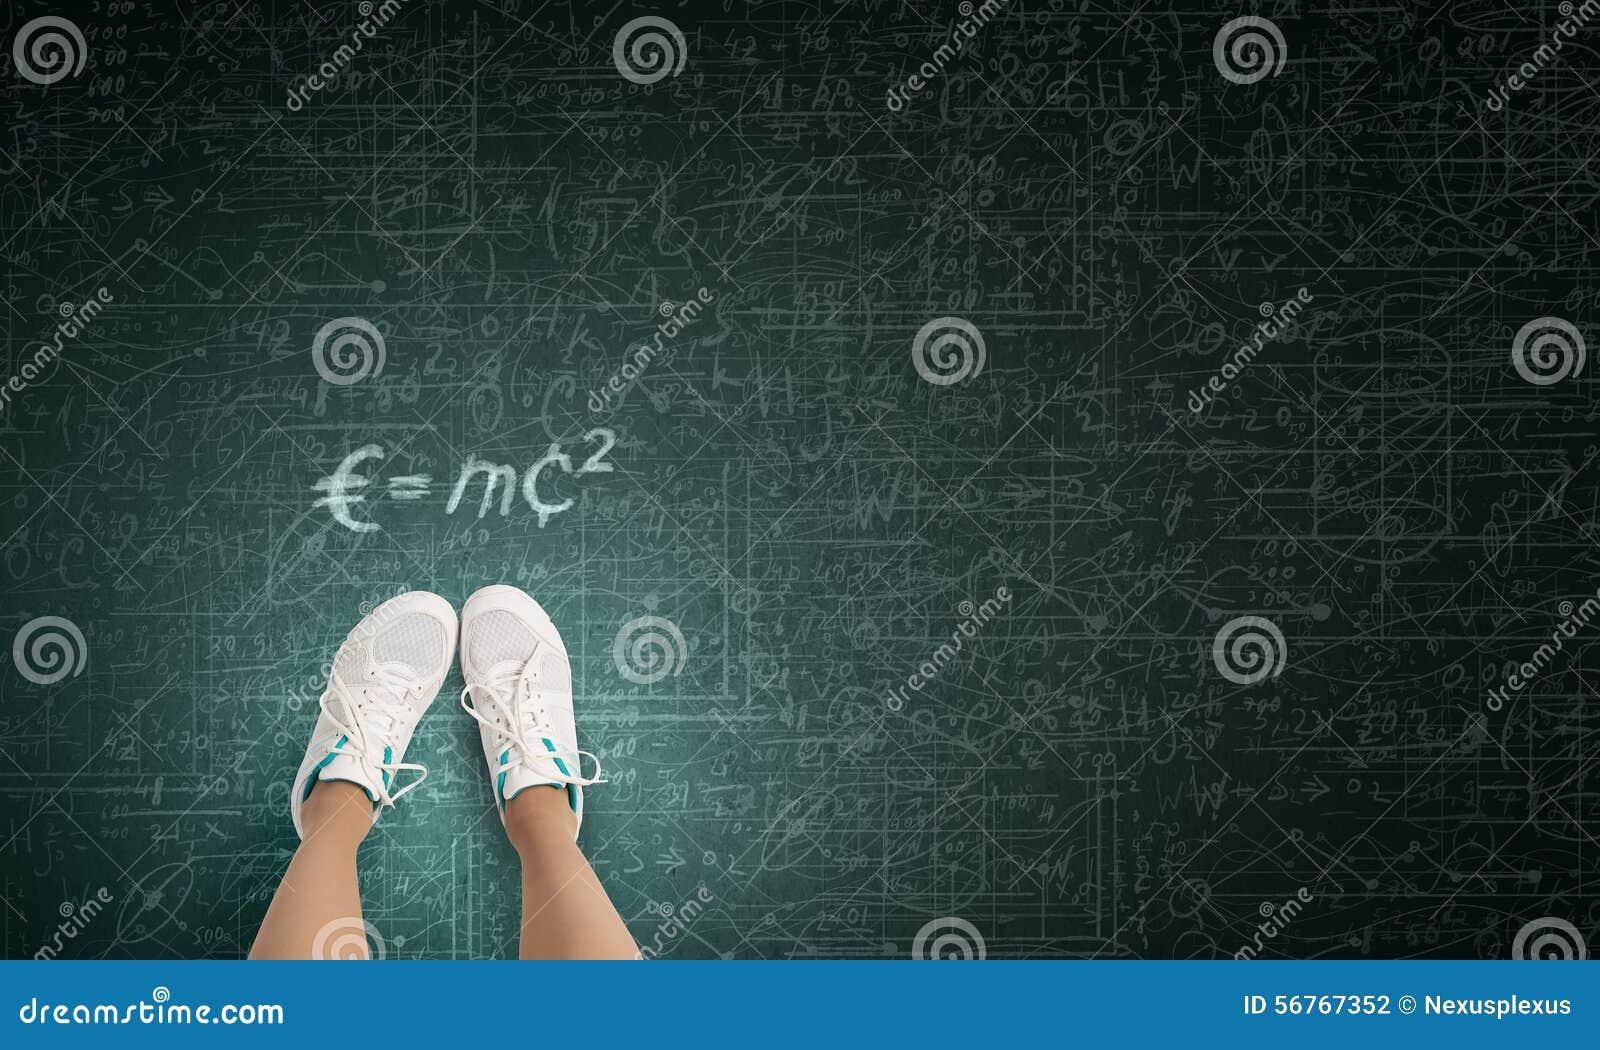 physics sydney top girls essay